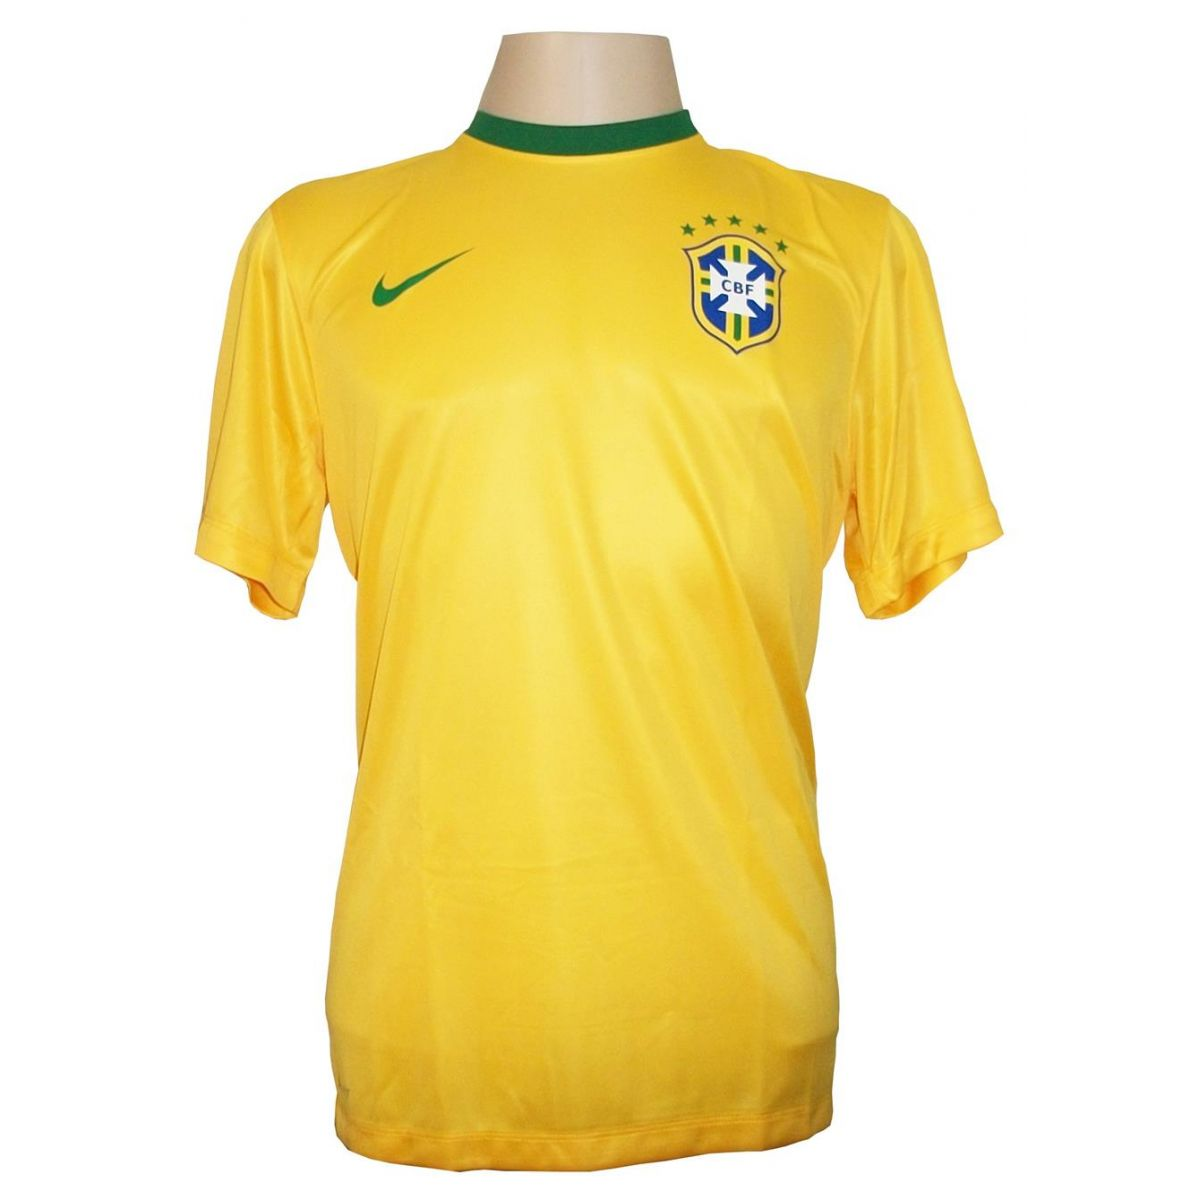 Camisa Brasil Home Infantil - Tecido Dri-fit - Nike